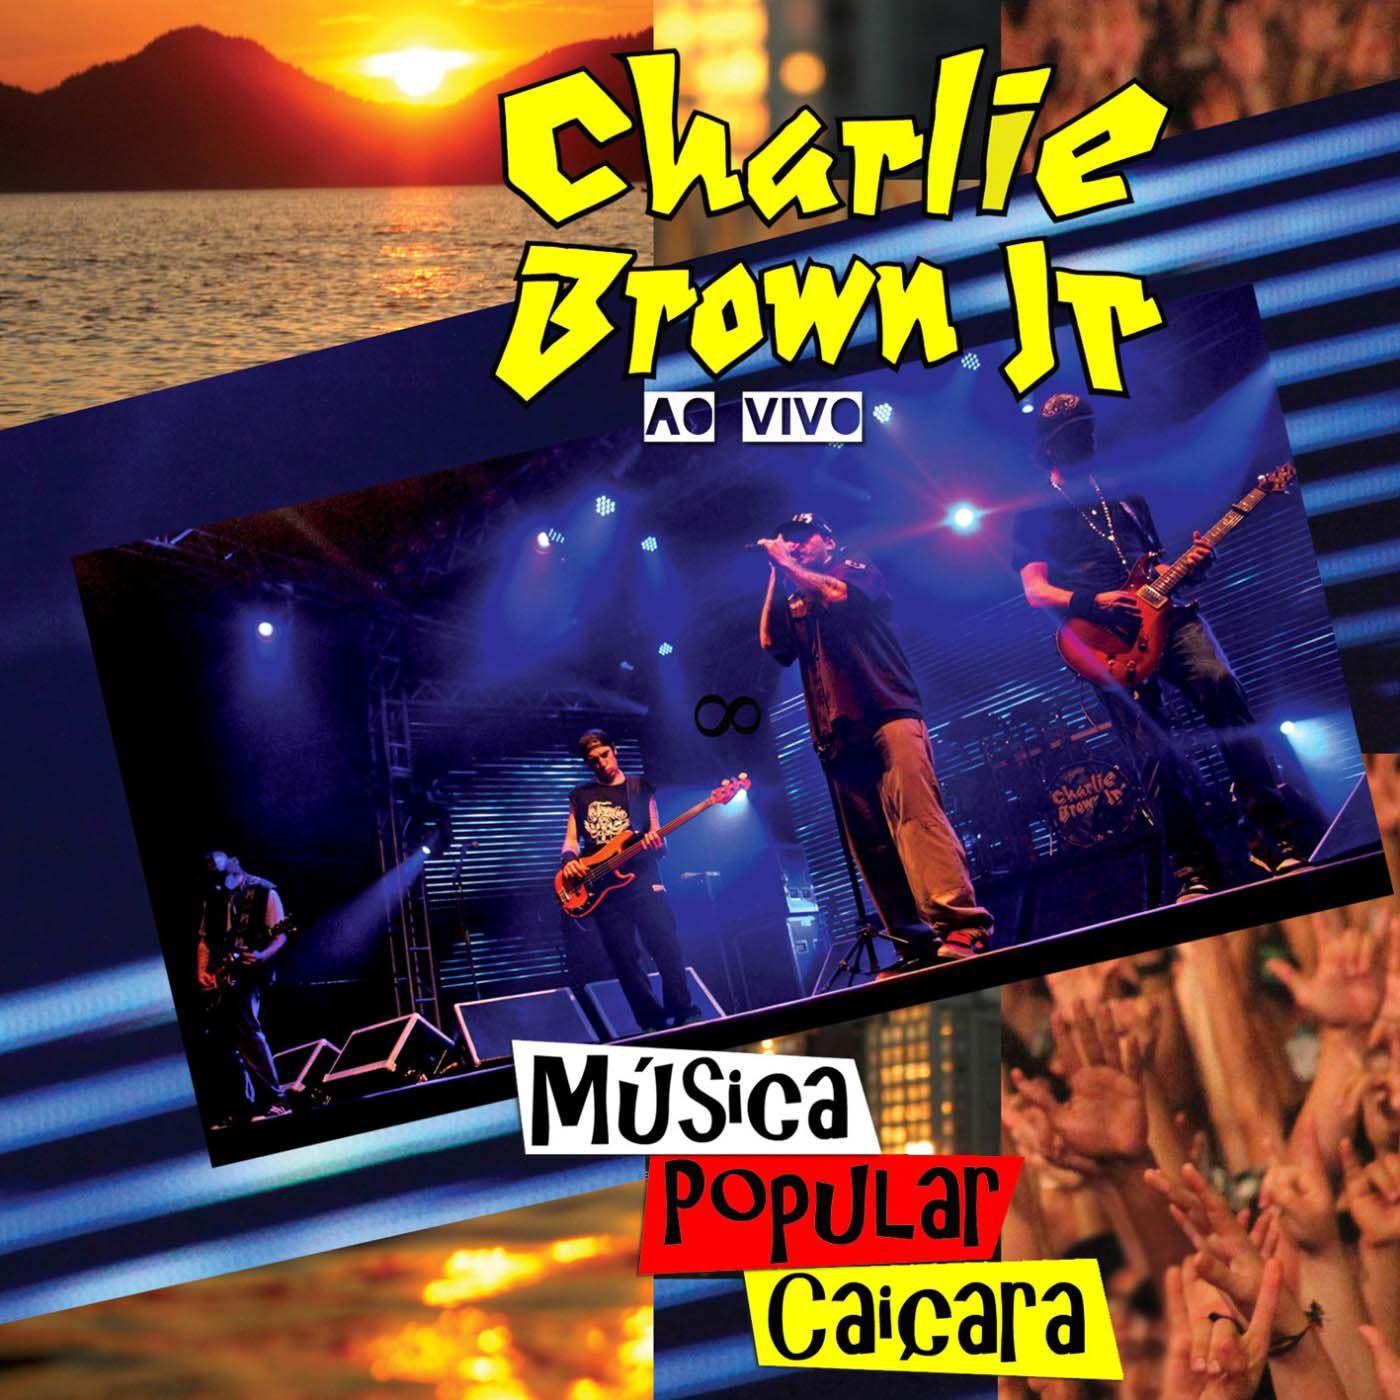 CD CHARLIE BROWN JR - MÚSICA POPULAR CAIÇARA VOL. 1